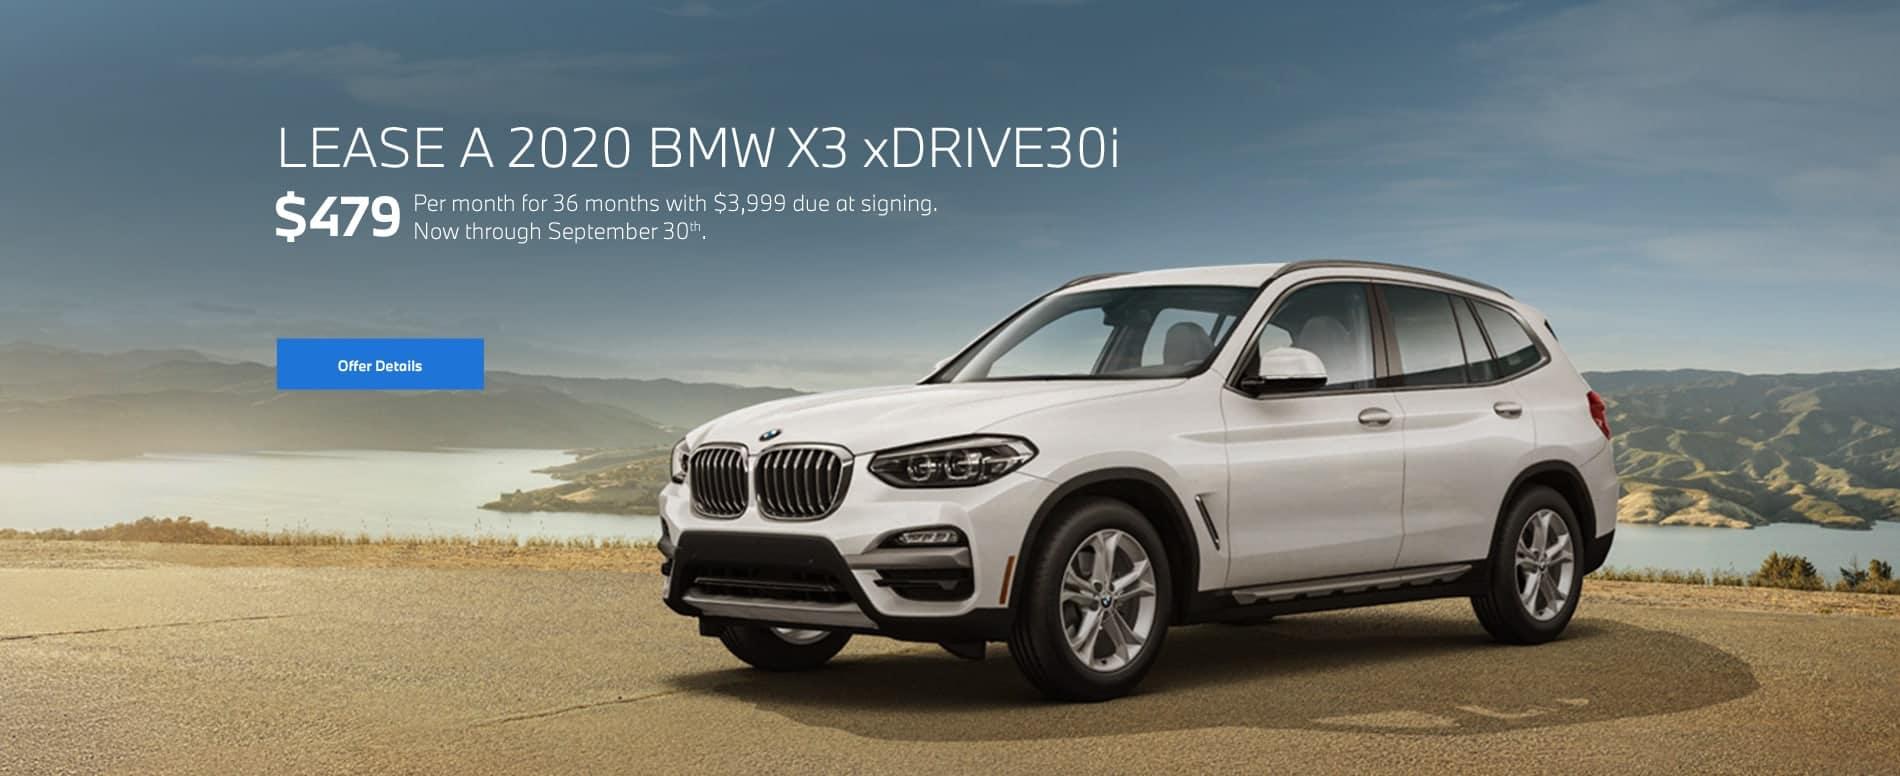 2020 BMW X3 xDrive30i for $479/mo